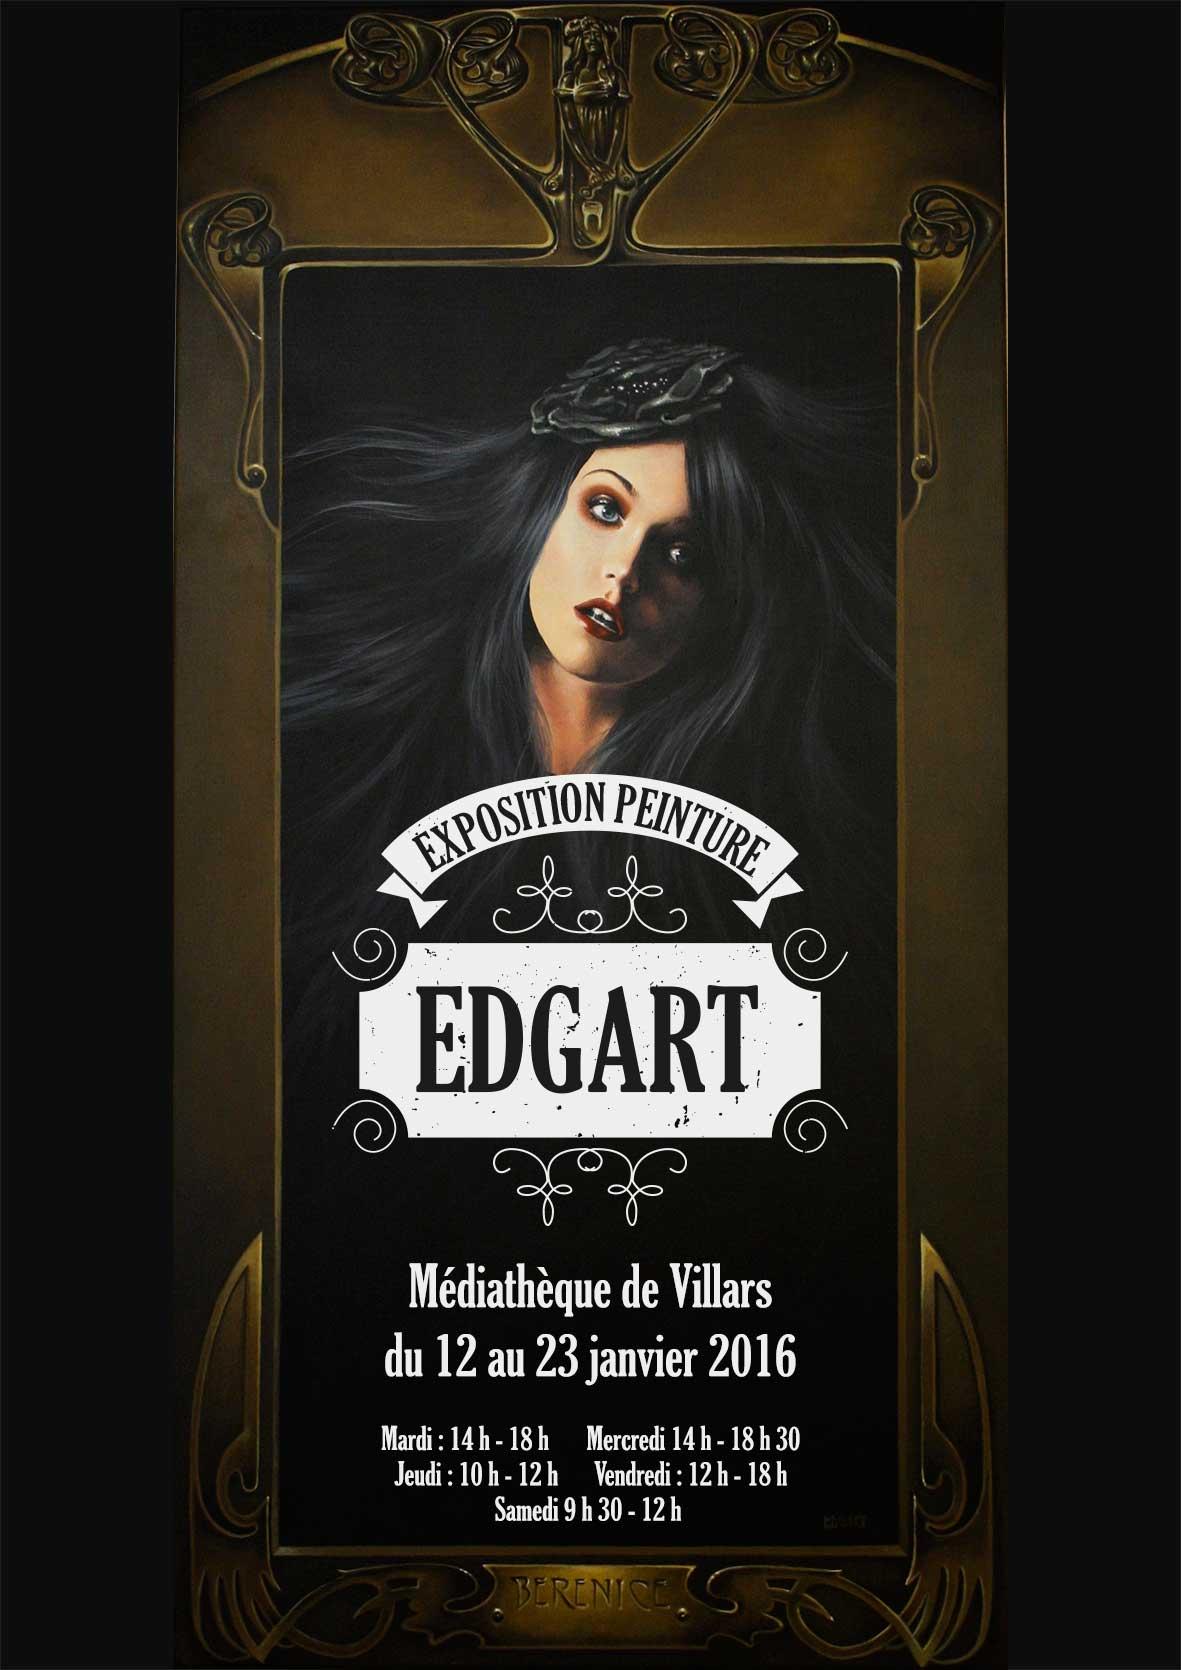 Affiche exposition peintre Edgar à Villars